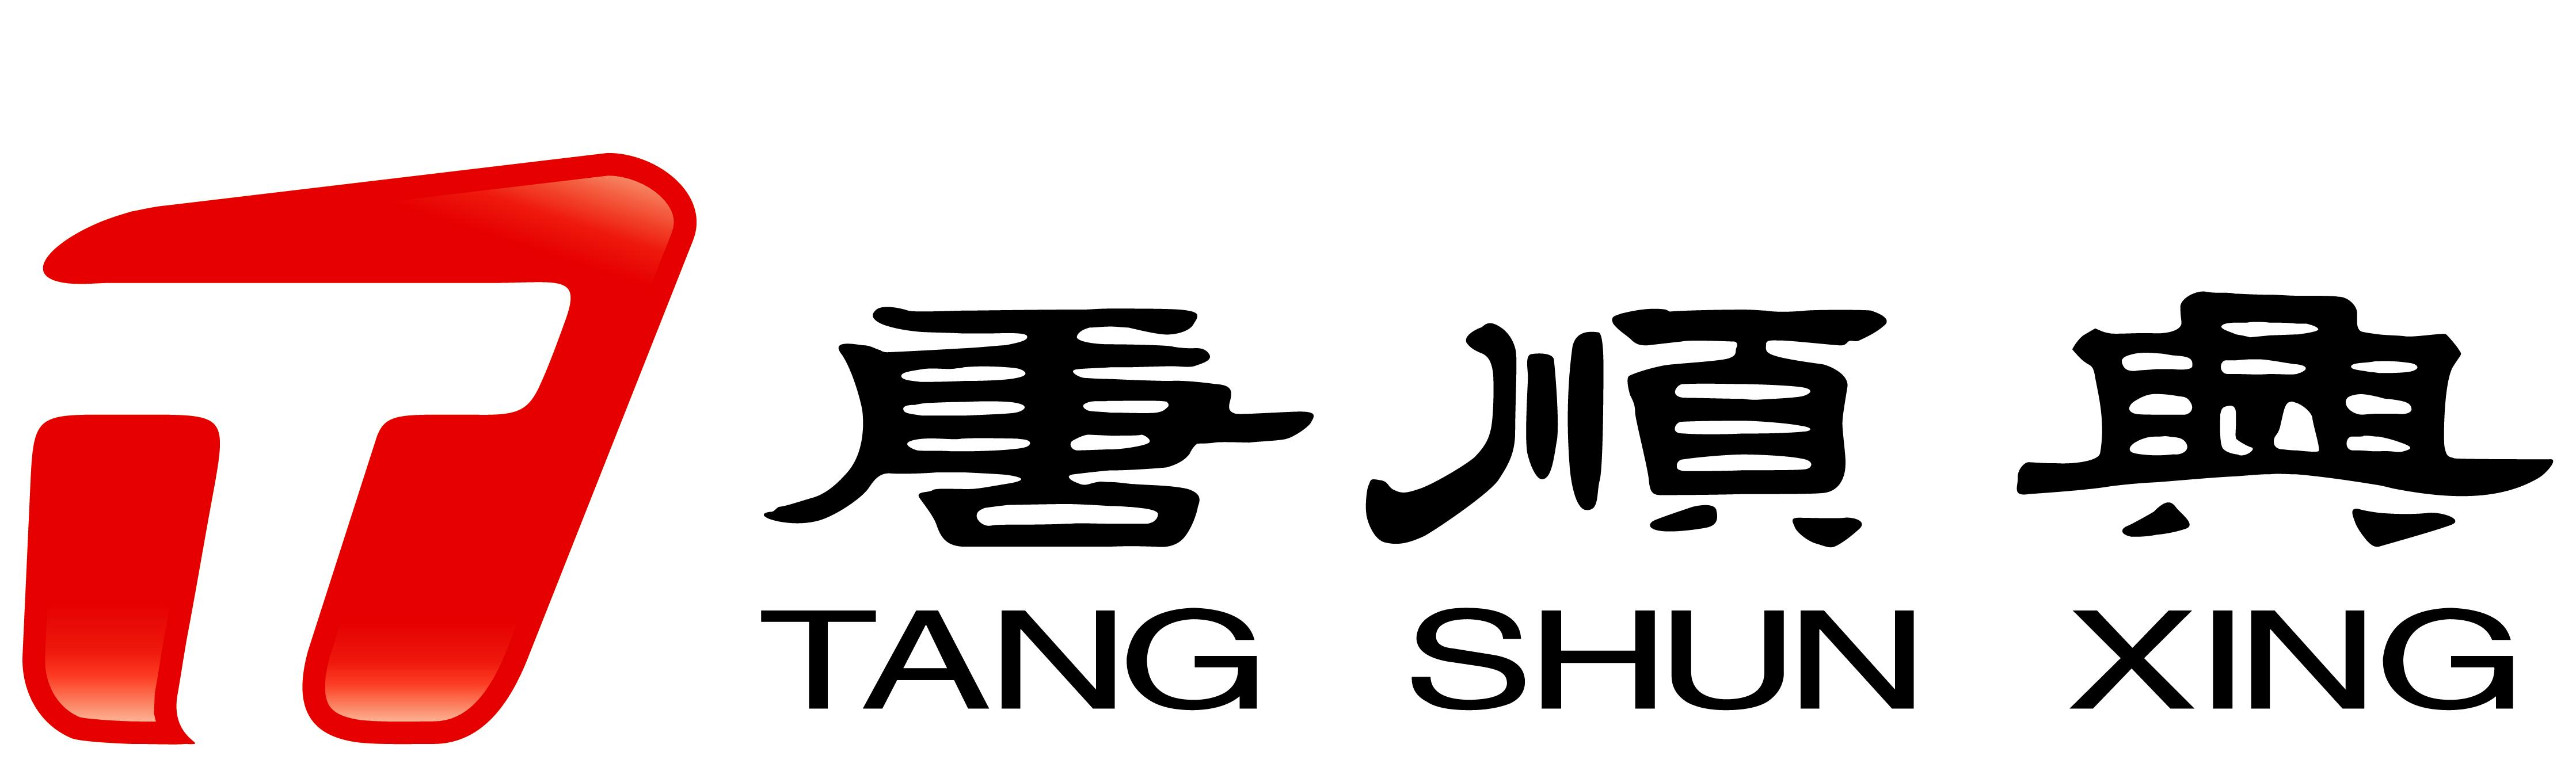 food scheme 2020 diamond Tong Shun Hing